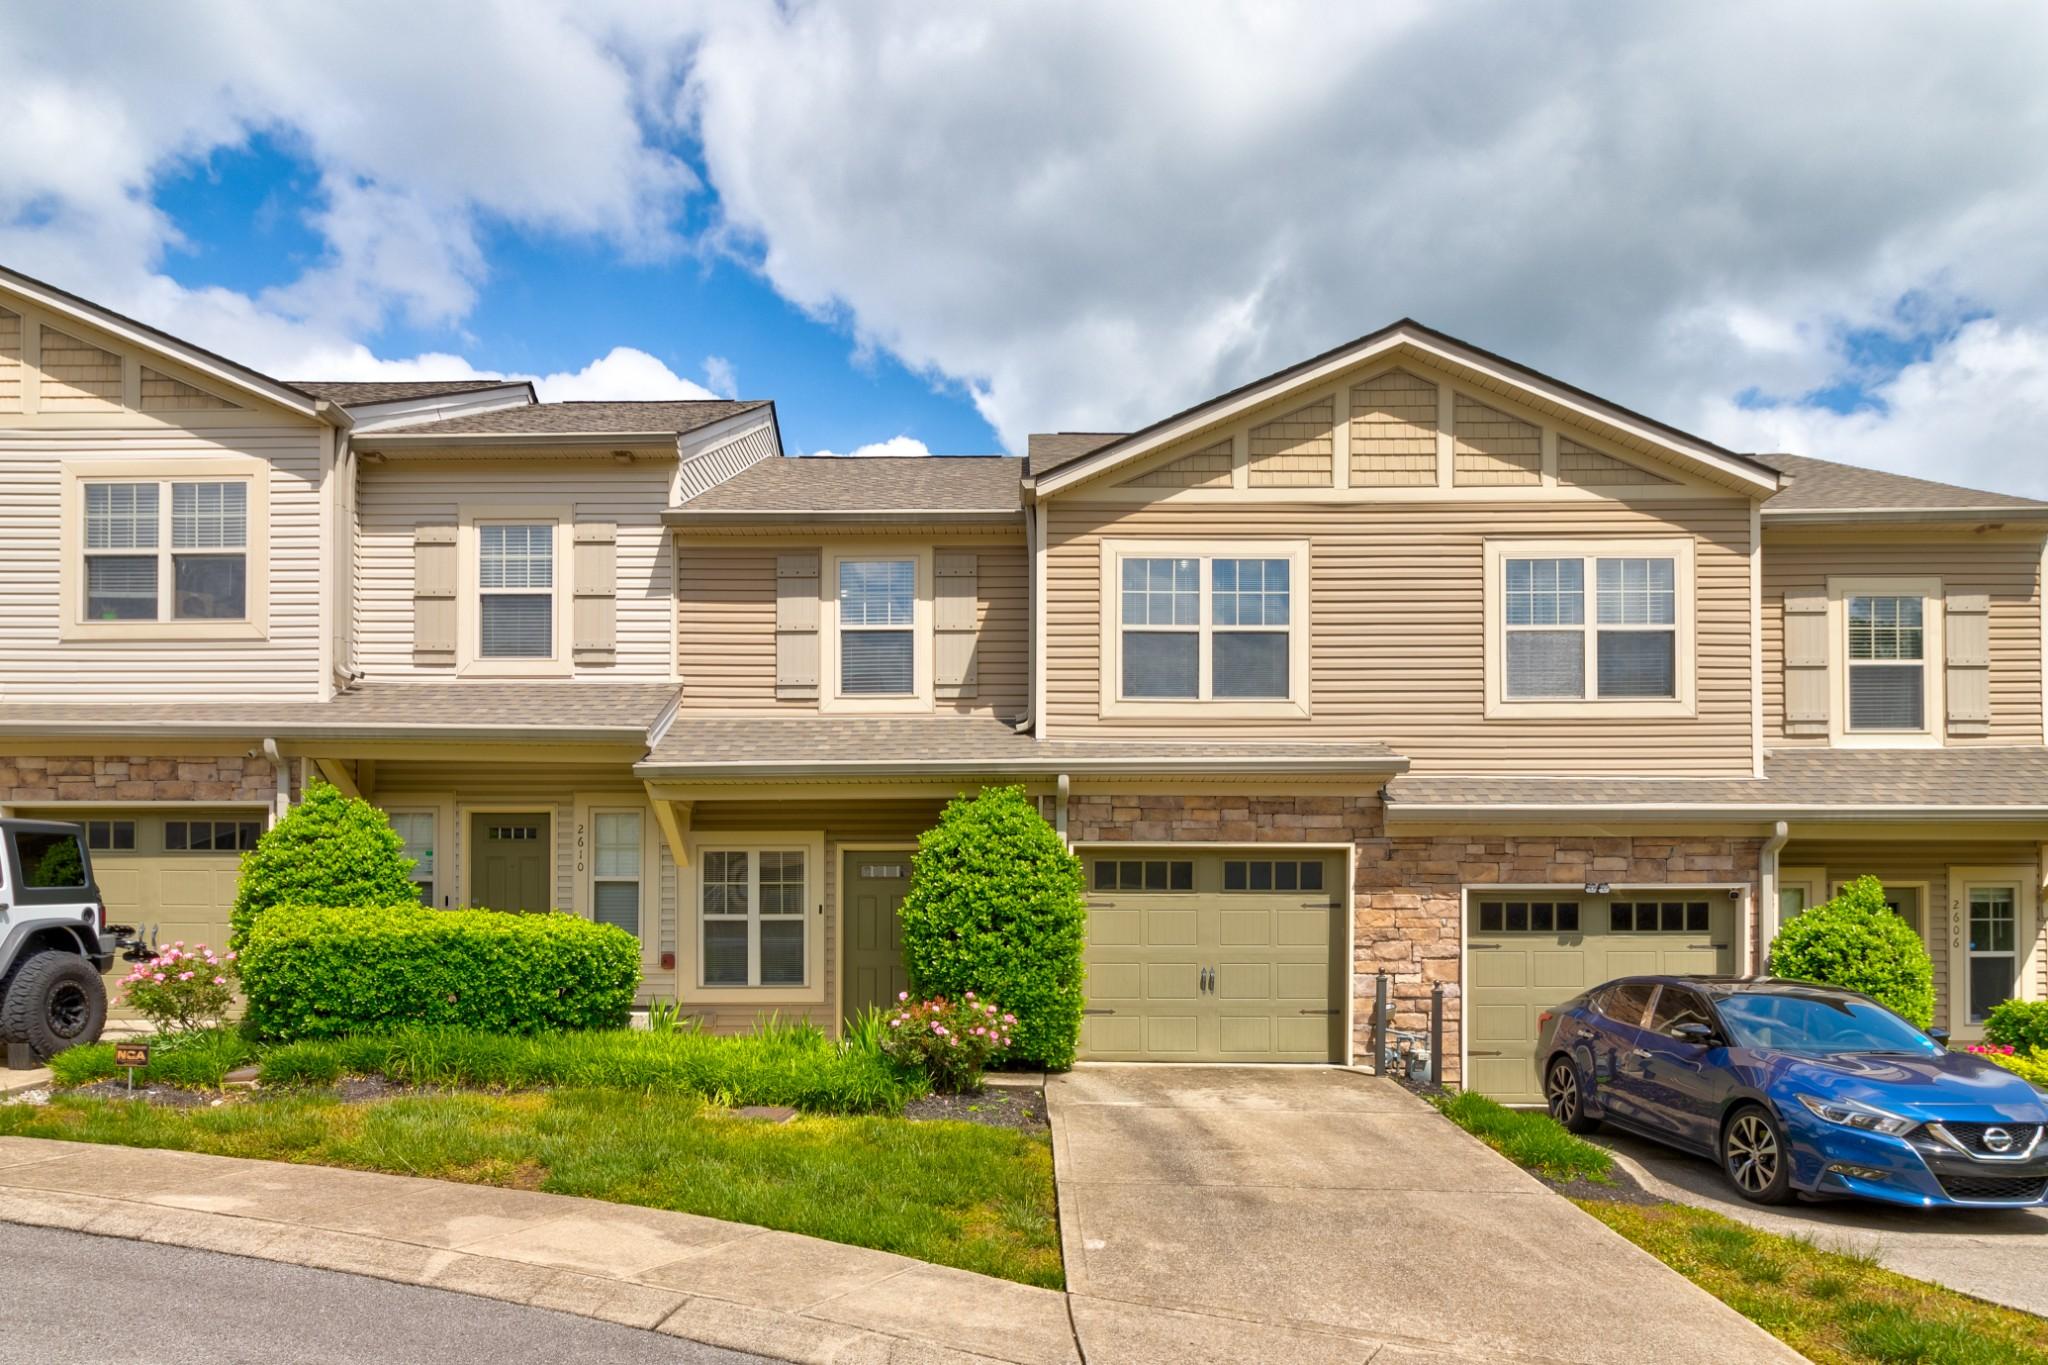 2608 Nashboro Blvd Property Photo - Nashville, TN real estate listing